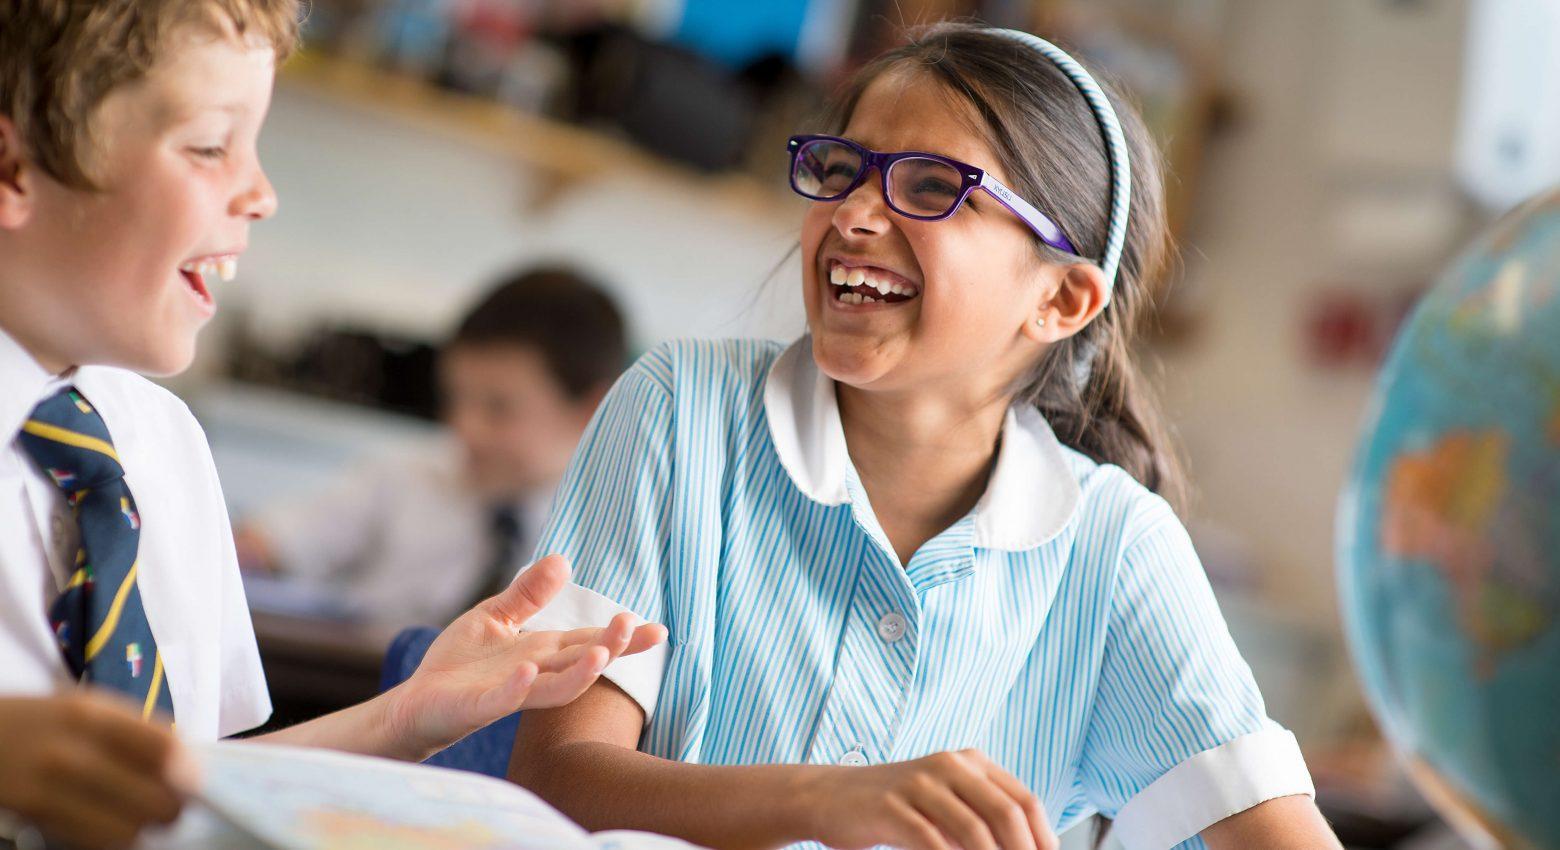 school children laughing in classroom